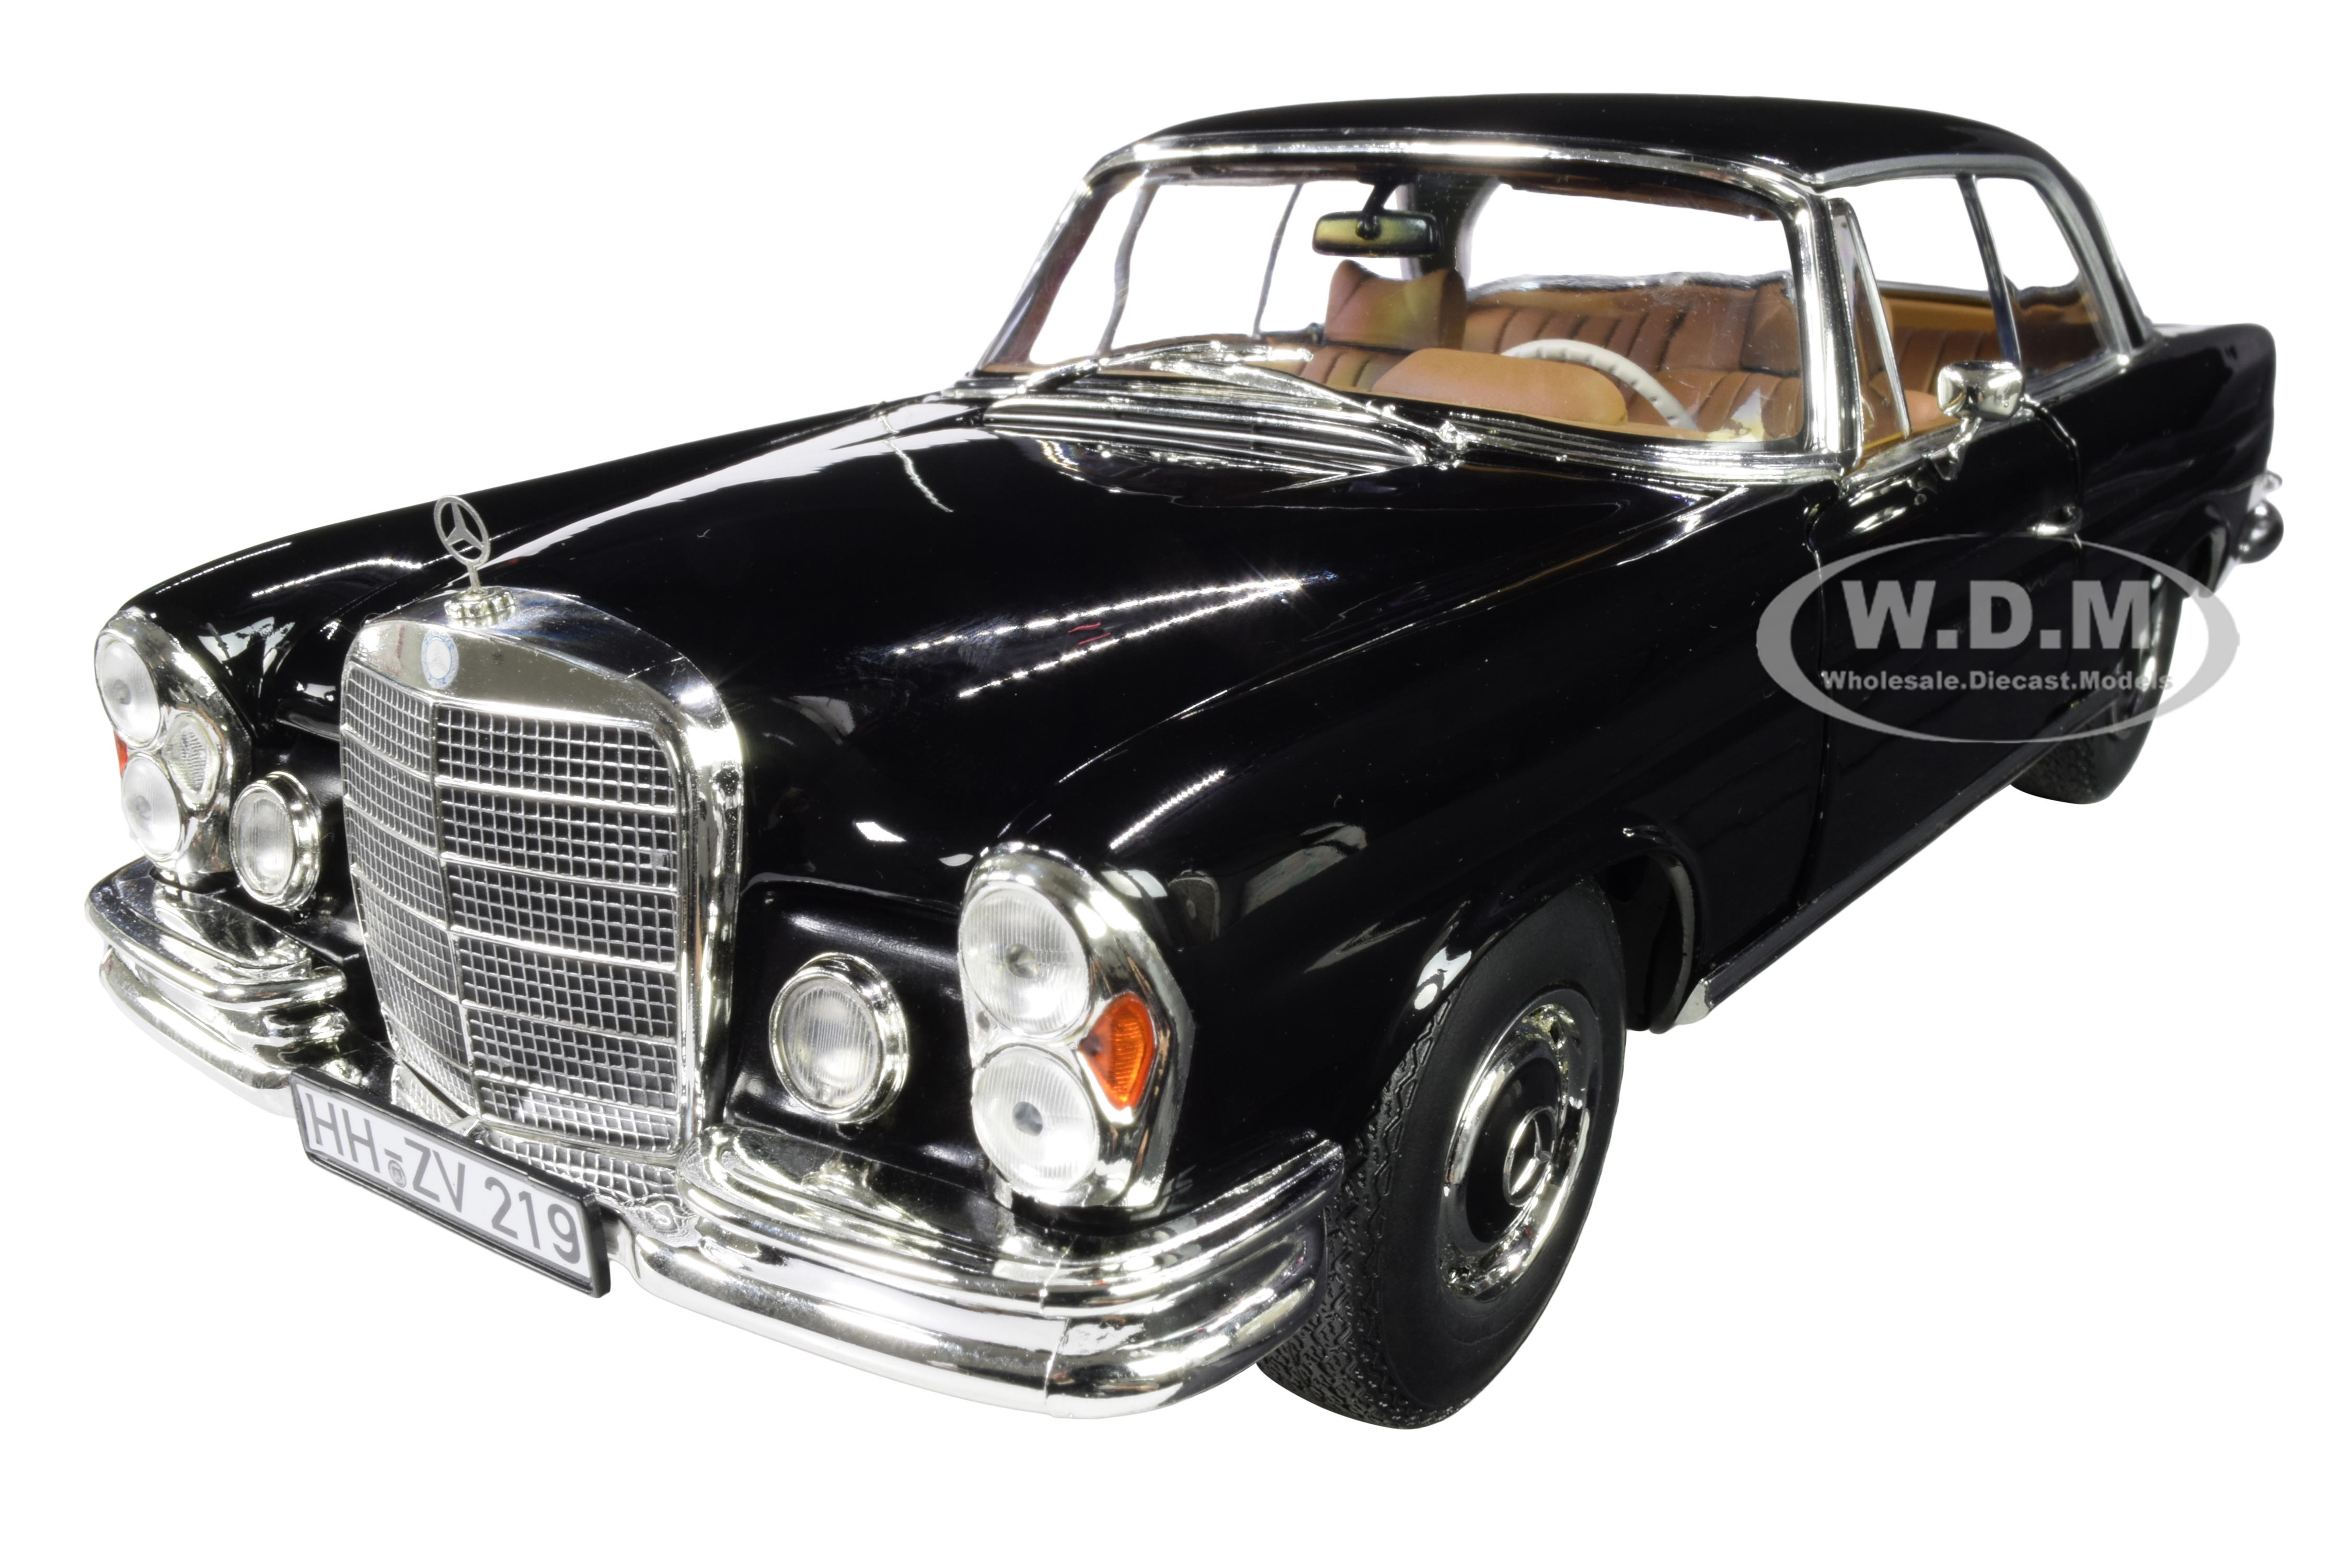 1969 Mercedes Benz 280 SE Coupe Black 1/18 Diecast Model Car by Norev